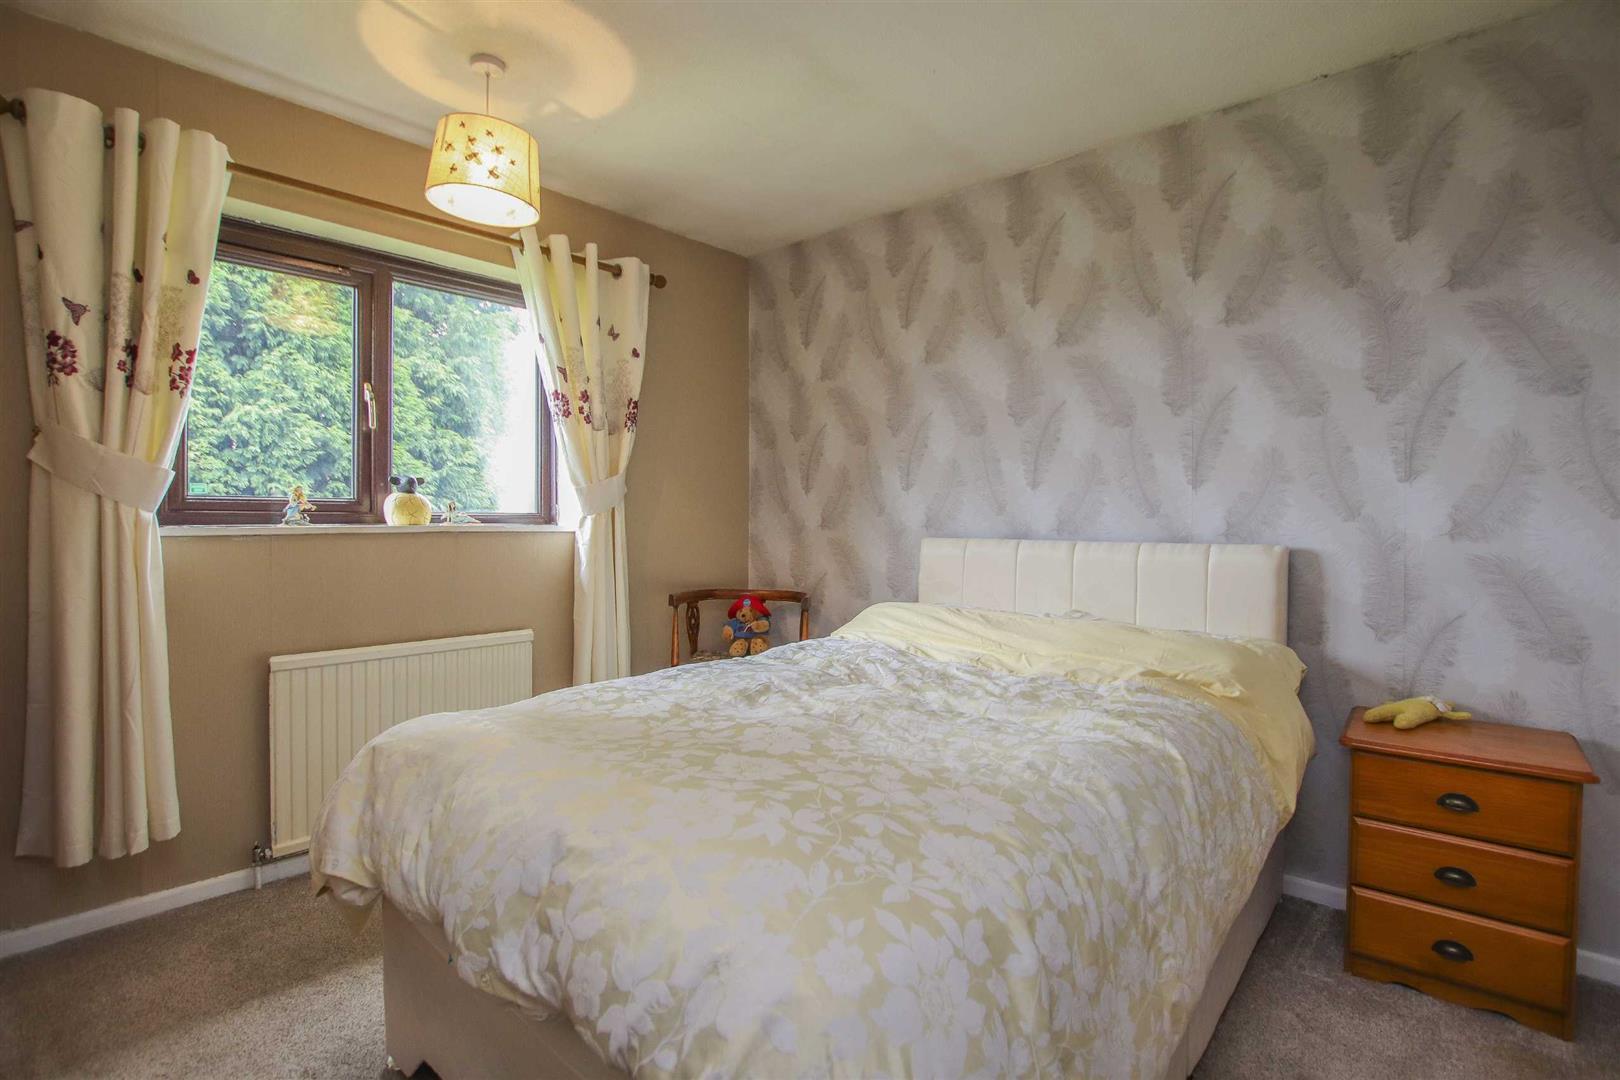 4 Bedroom Semi-detached House For Sale - Image 7